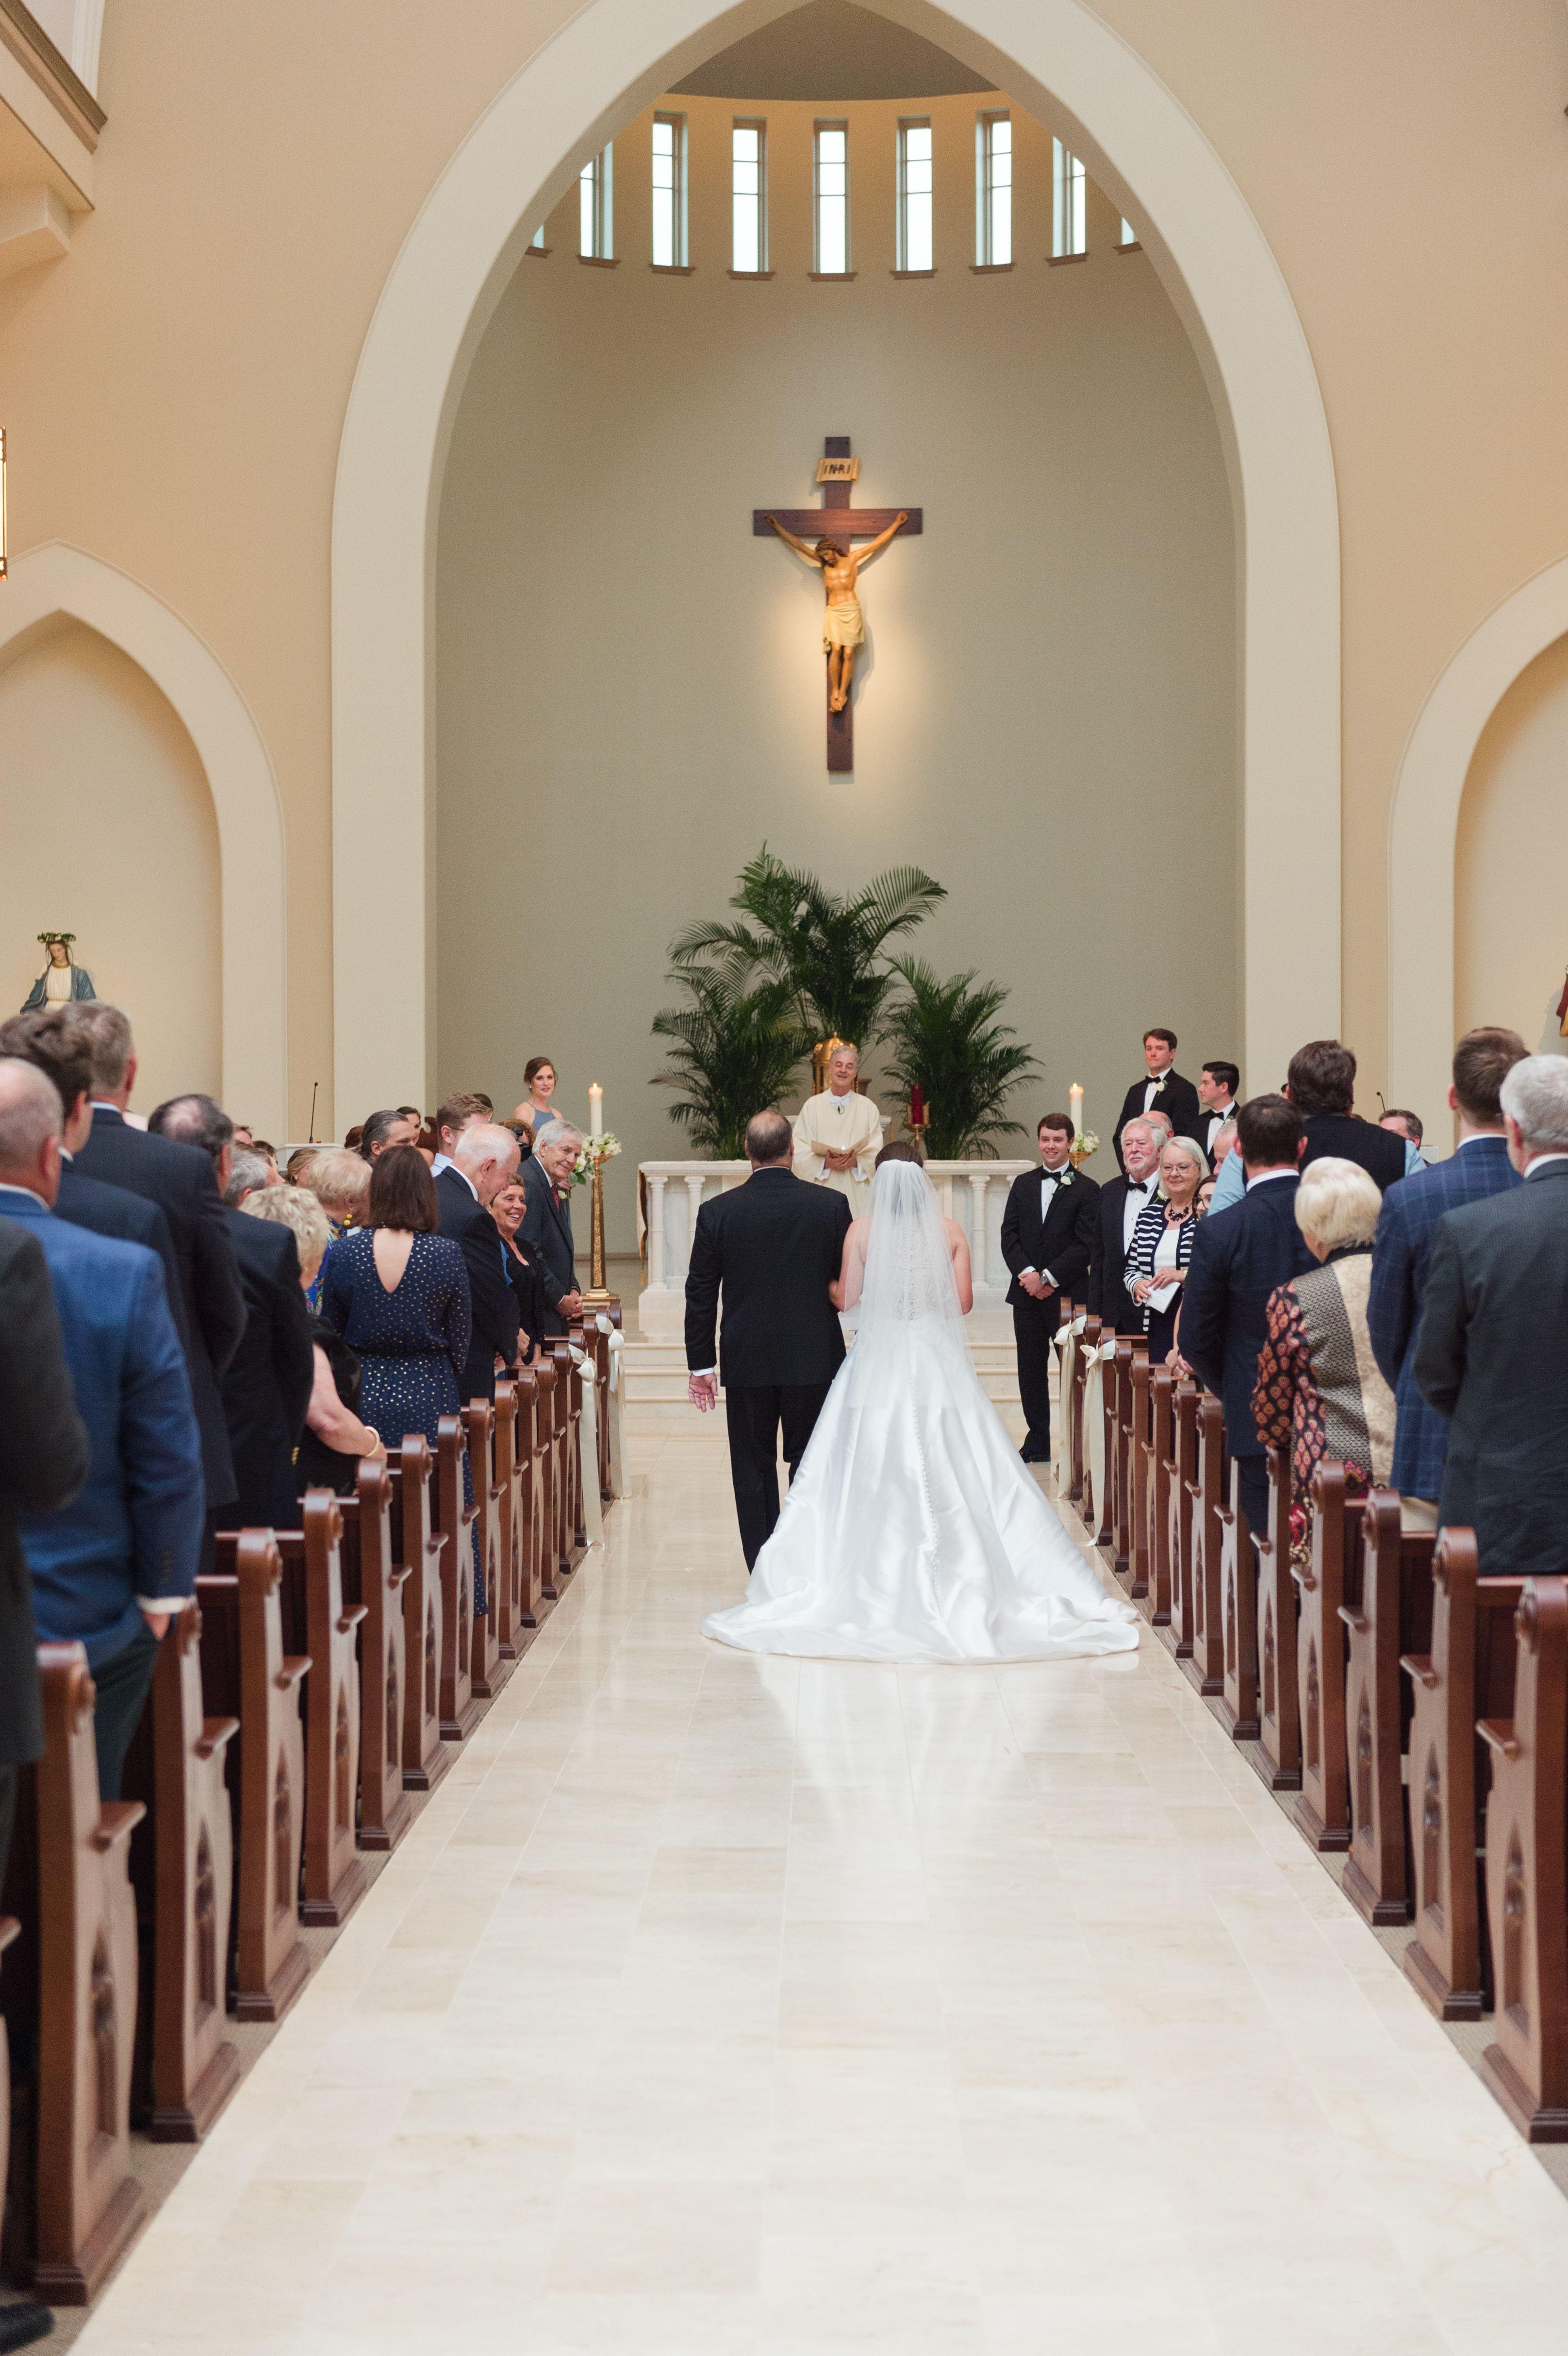 University Sweethearts Wedding Meredith Ryncarz Photography Heirloom Wedding Advice For Bride Spring Wedding Colors